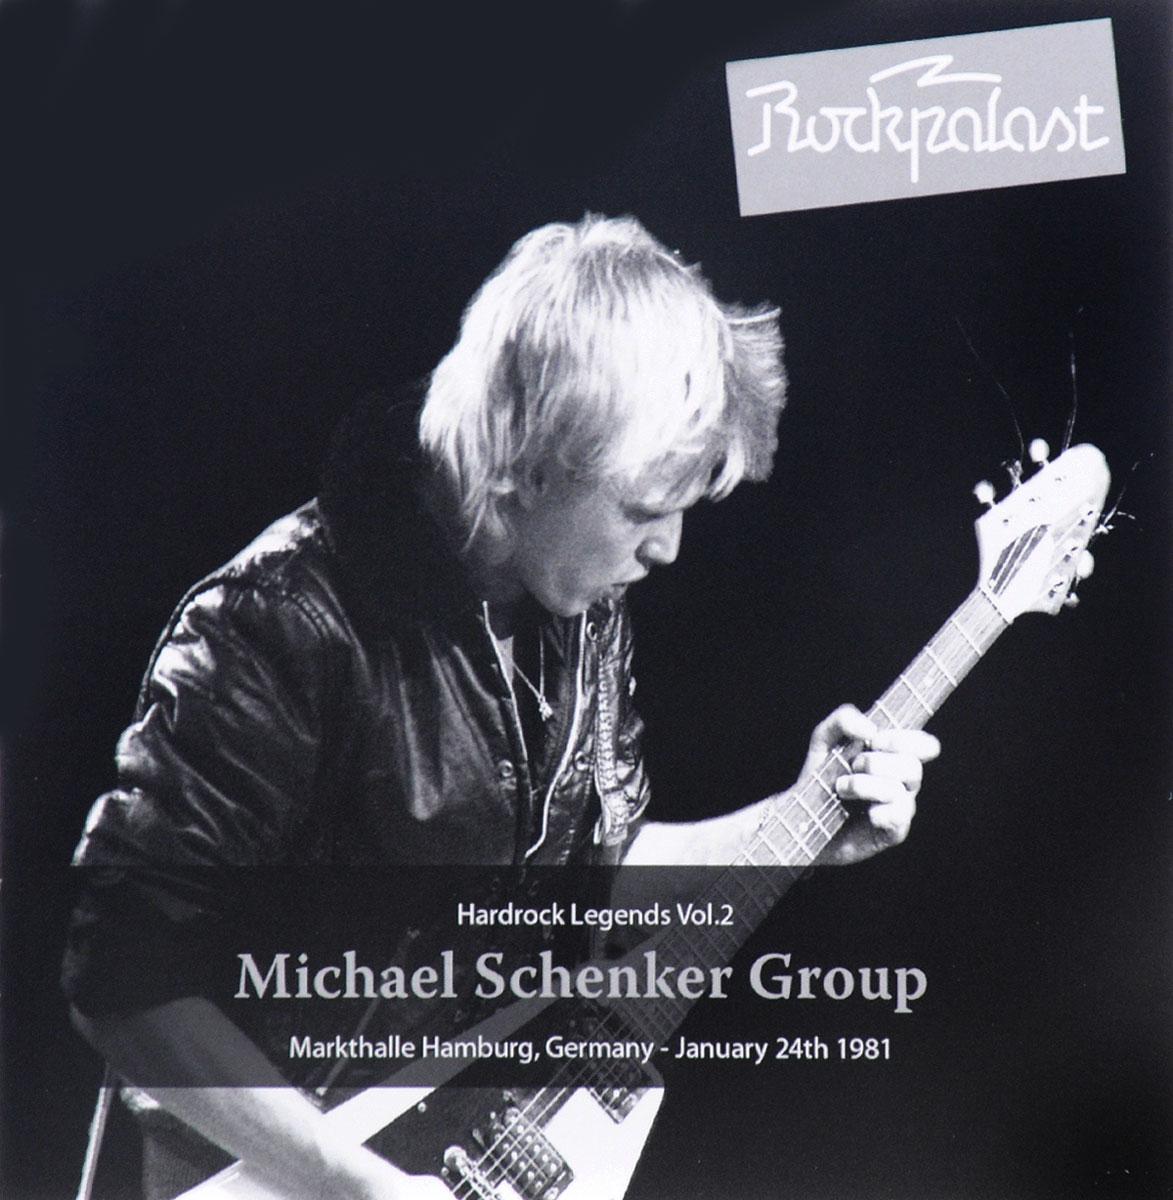 The Michael Schenker Group Michael Schenker Group. Hardrock Legends. Vol. 2 the michael schenker group michael schenker group hardrock legends vol 2